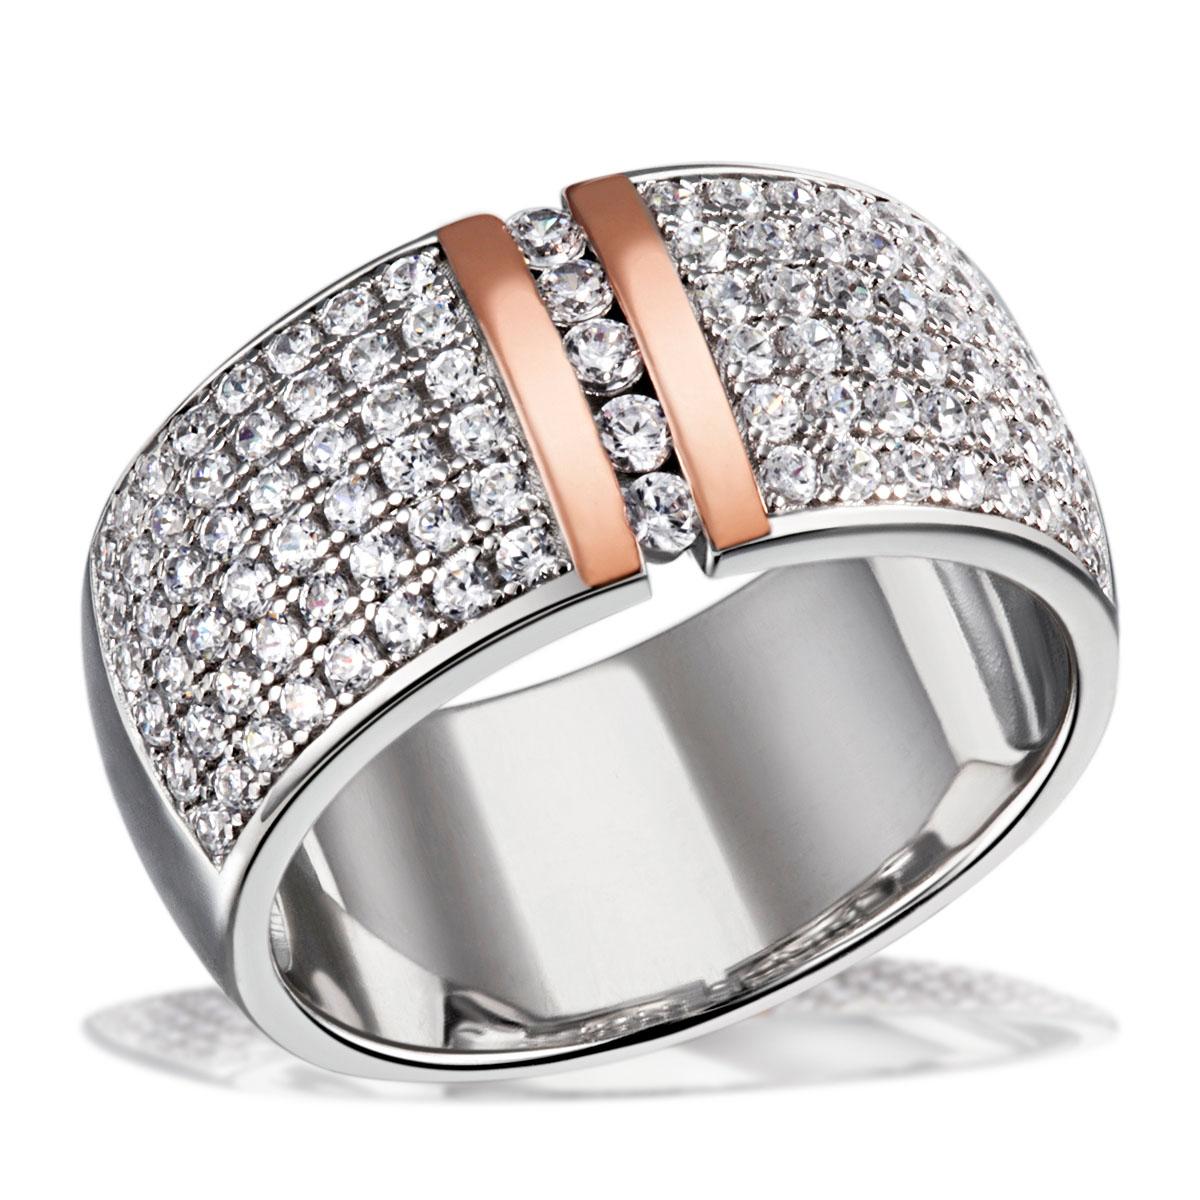 Goldmaid-Kette-Ring-oder-Ohrring-925-Sterlingsilber-Zirkonia-Echtschmuck-NEU